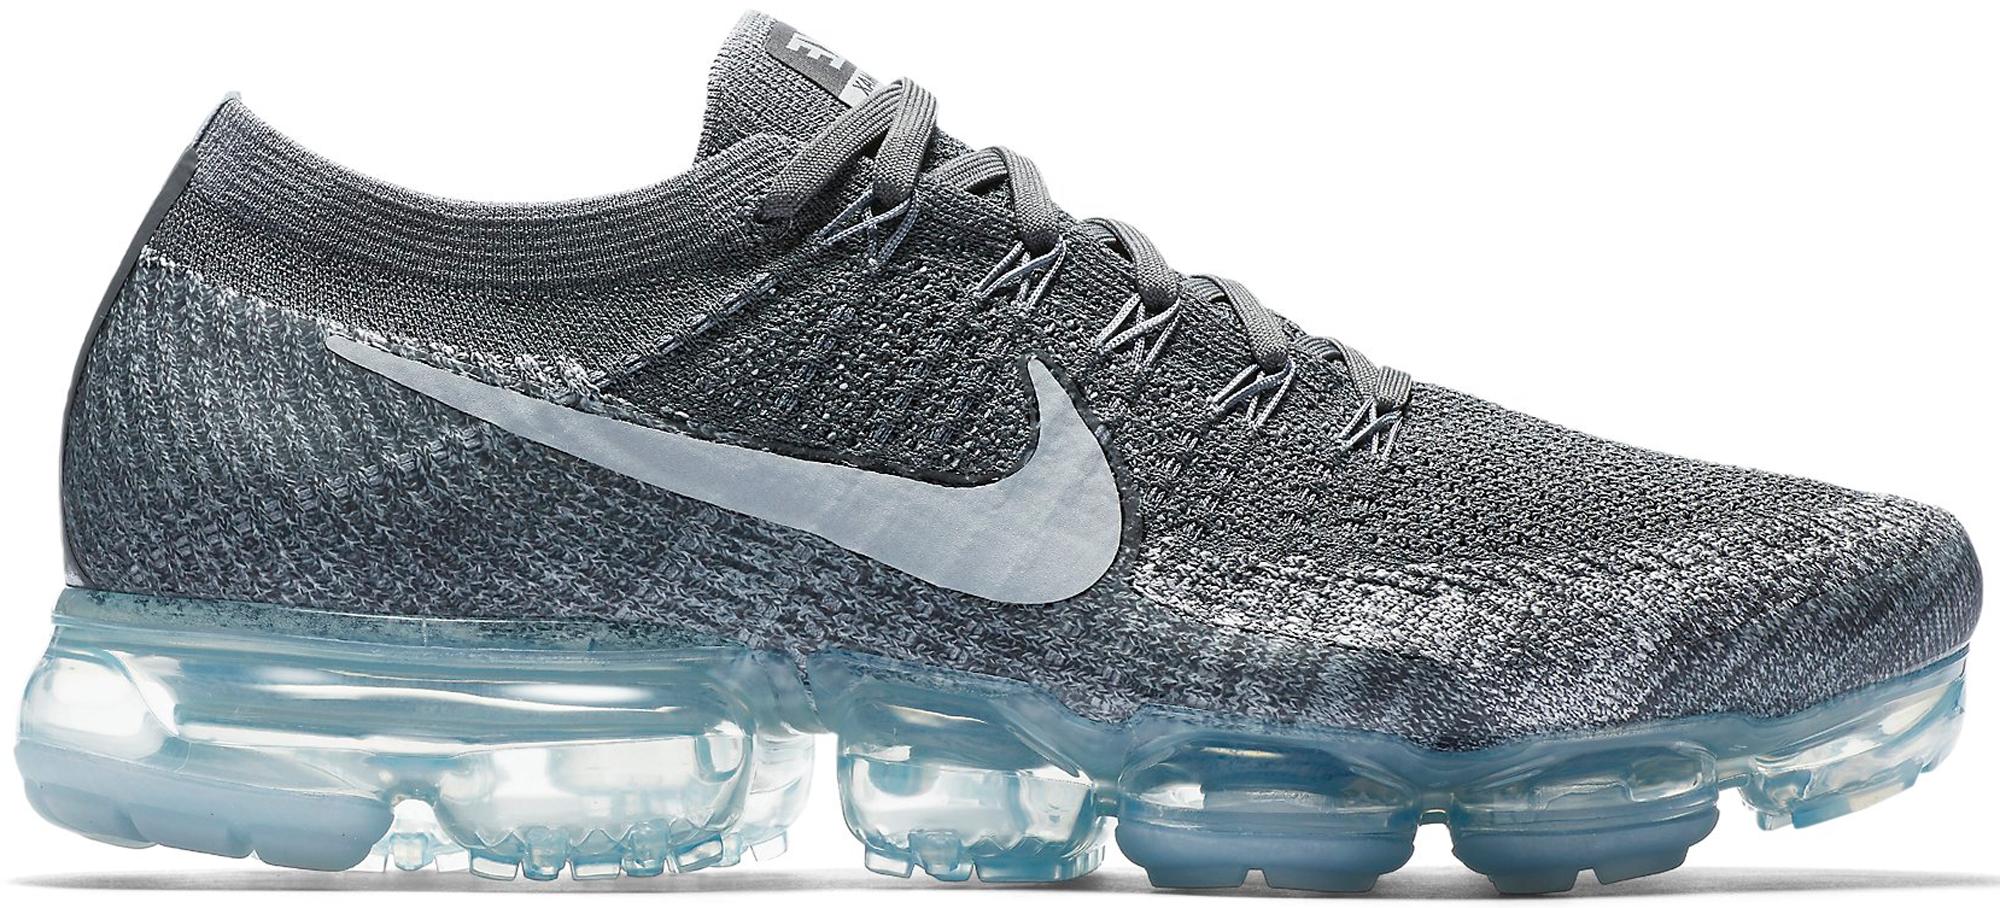 Sneakers Nike Air Force 1 Basse personalizzate ≡ Seddy's Custom